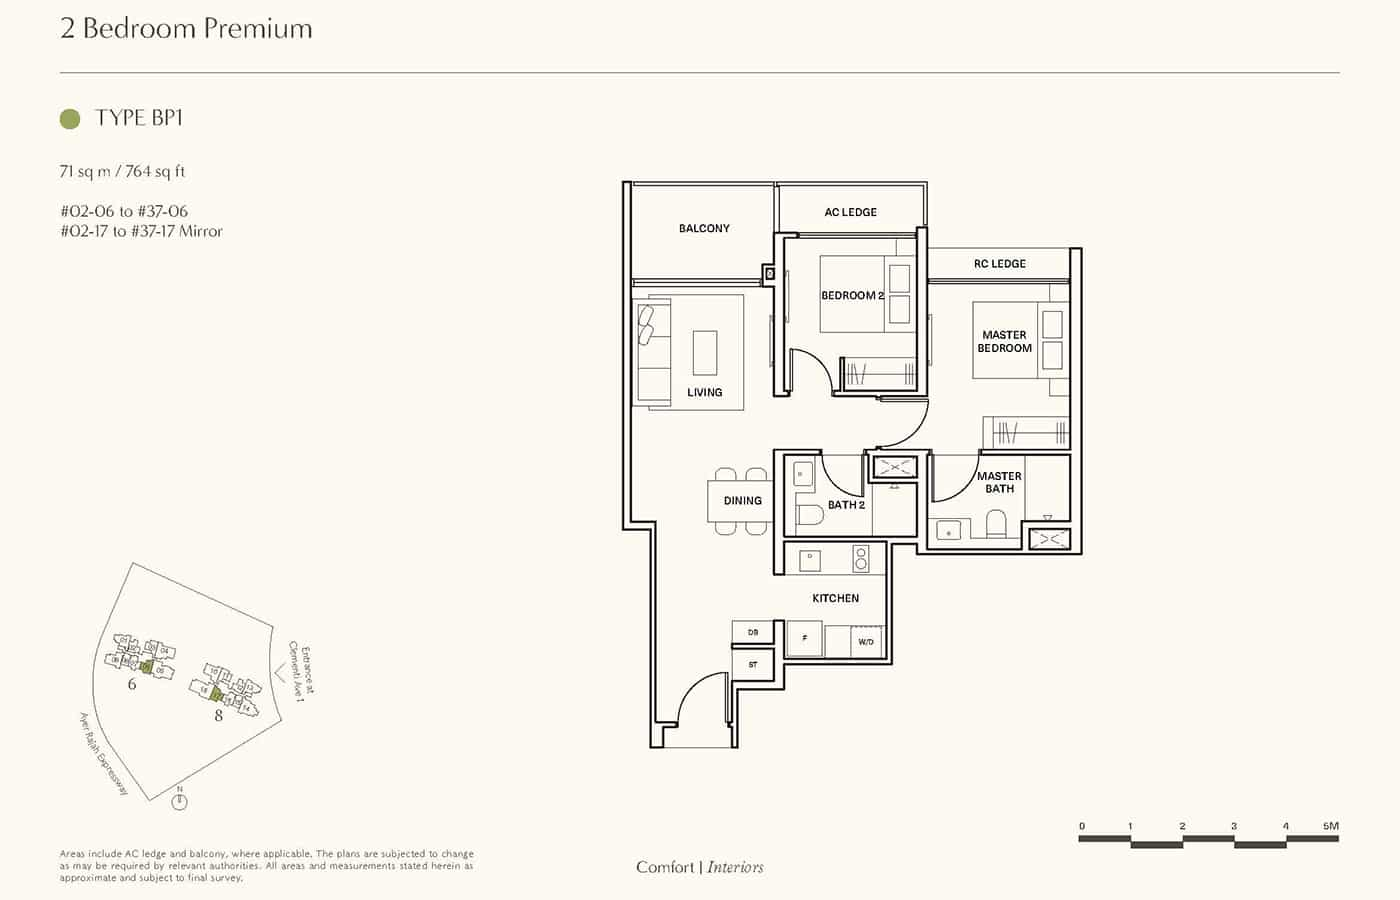 Clavon Condo Floor Plans - 2 Bedroom Premium BP1